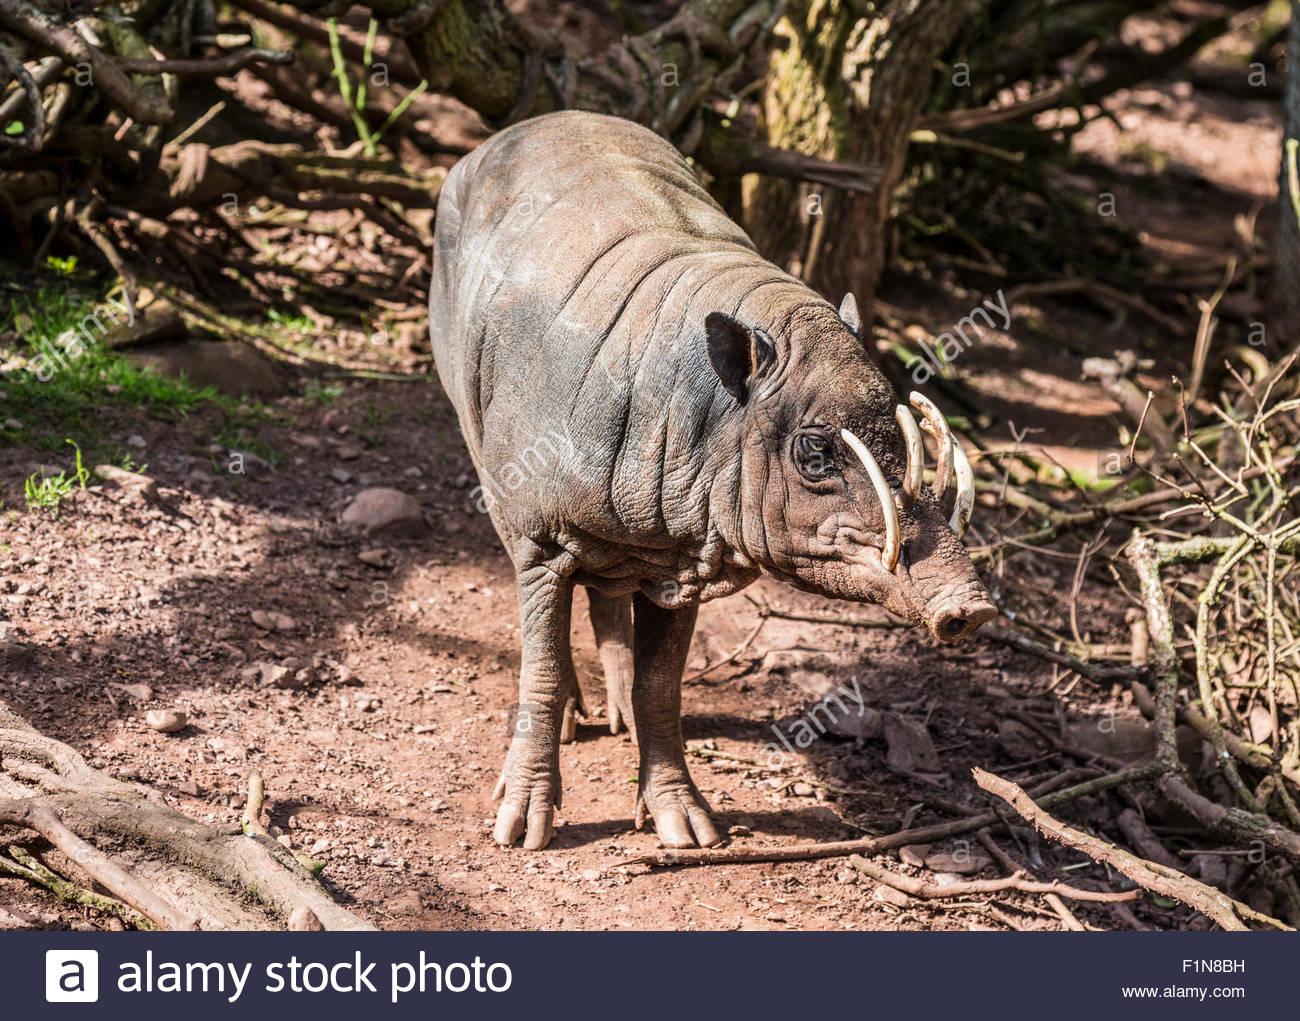 Very wary babirusa - Stock Image